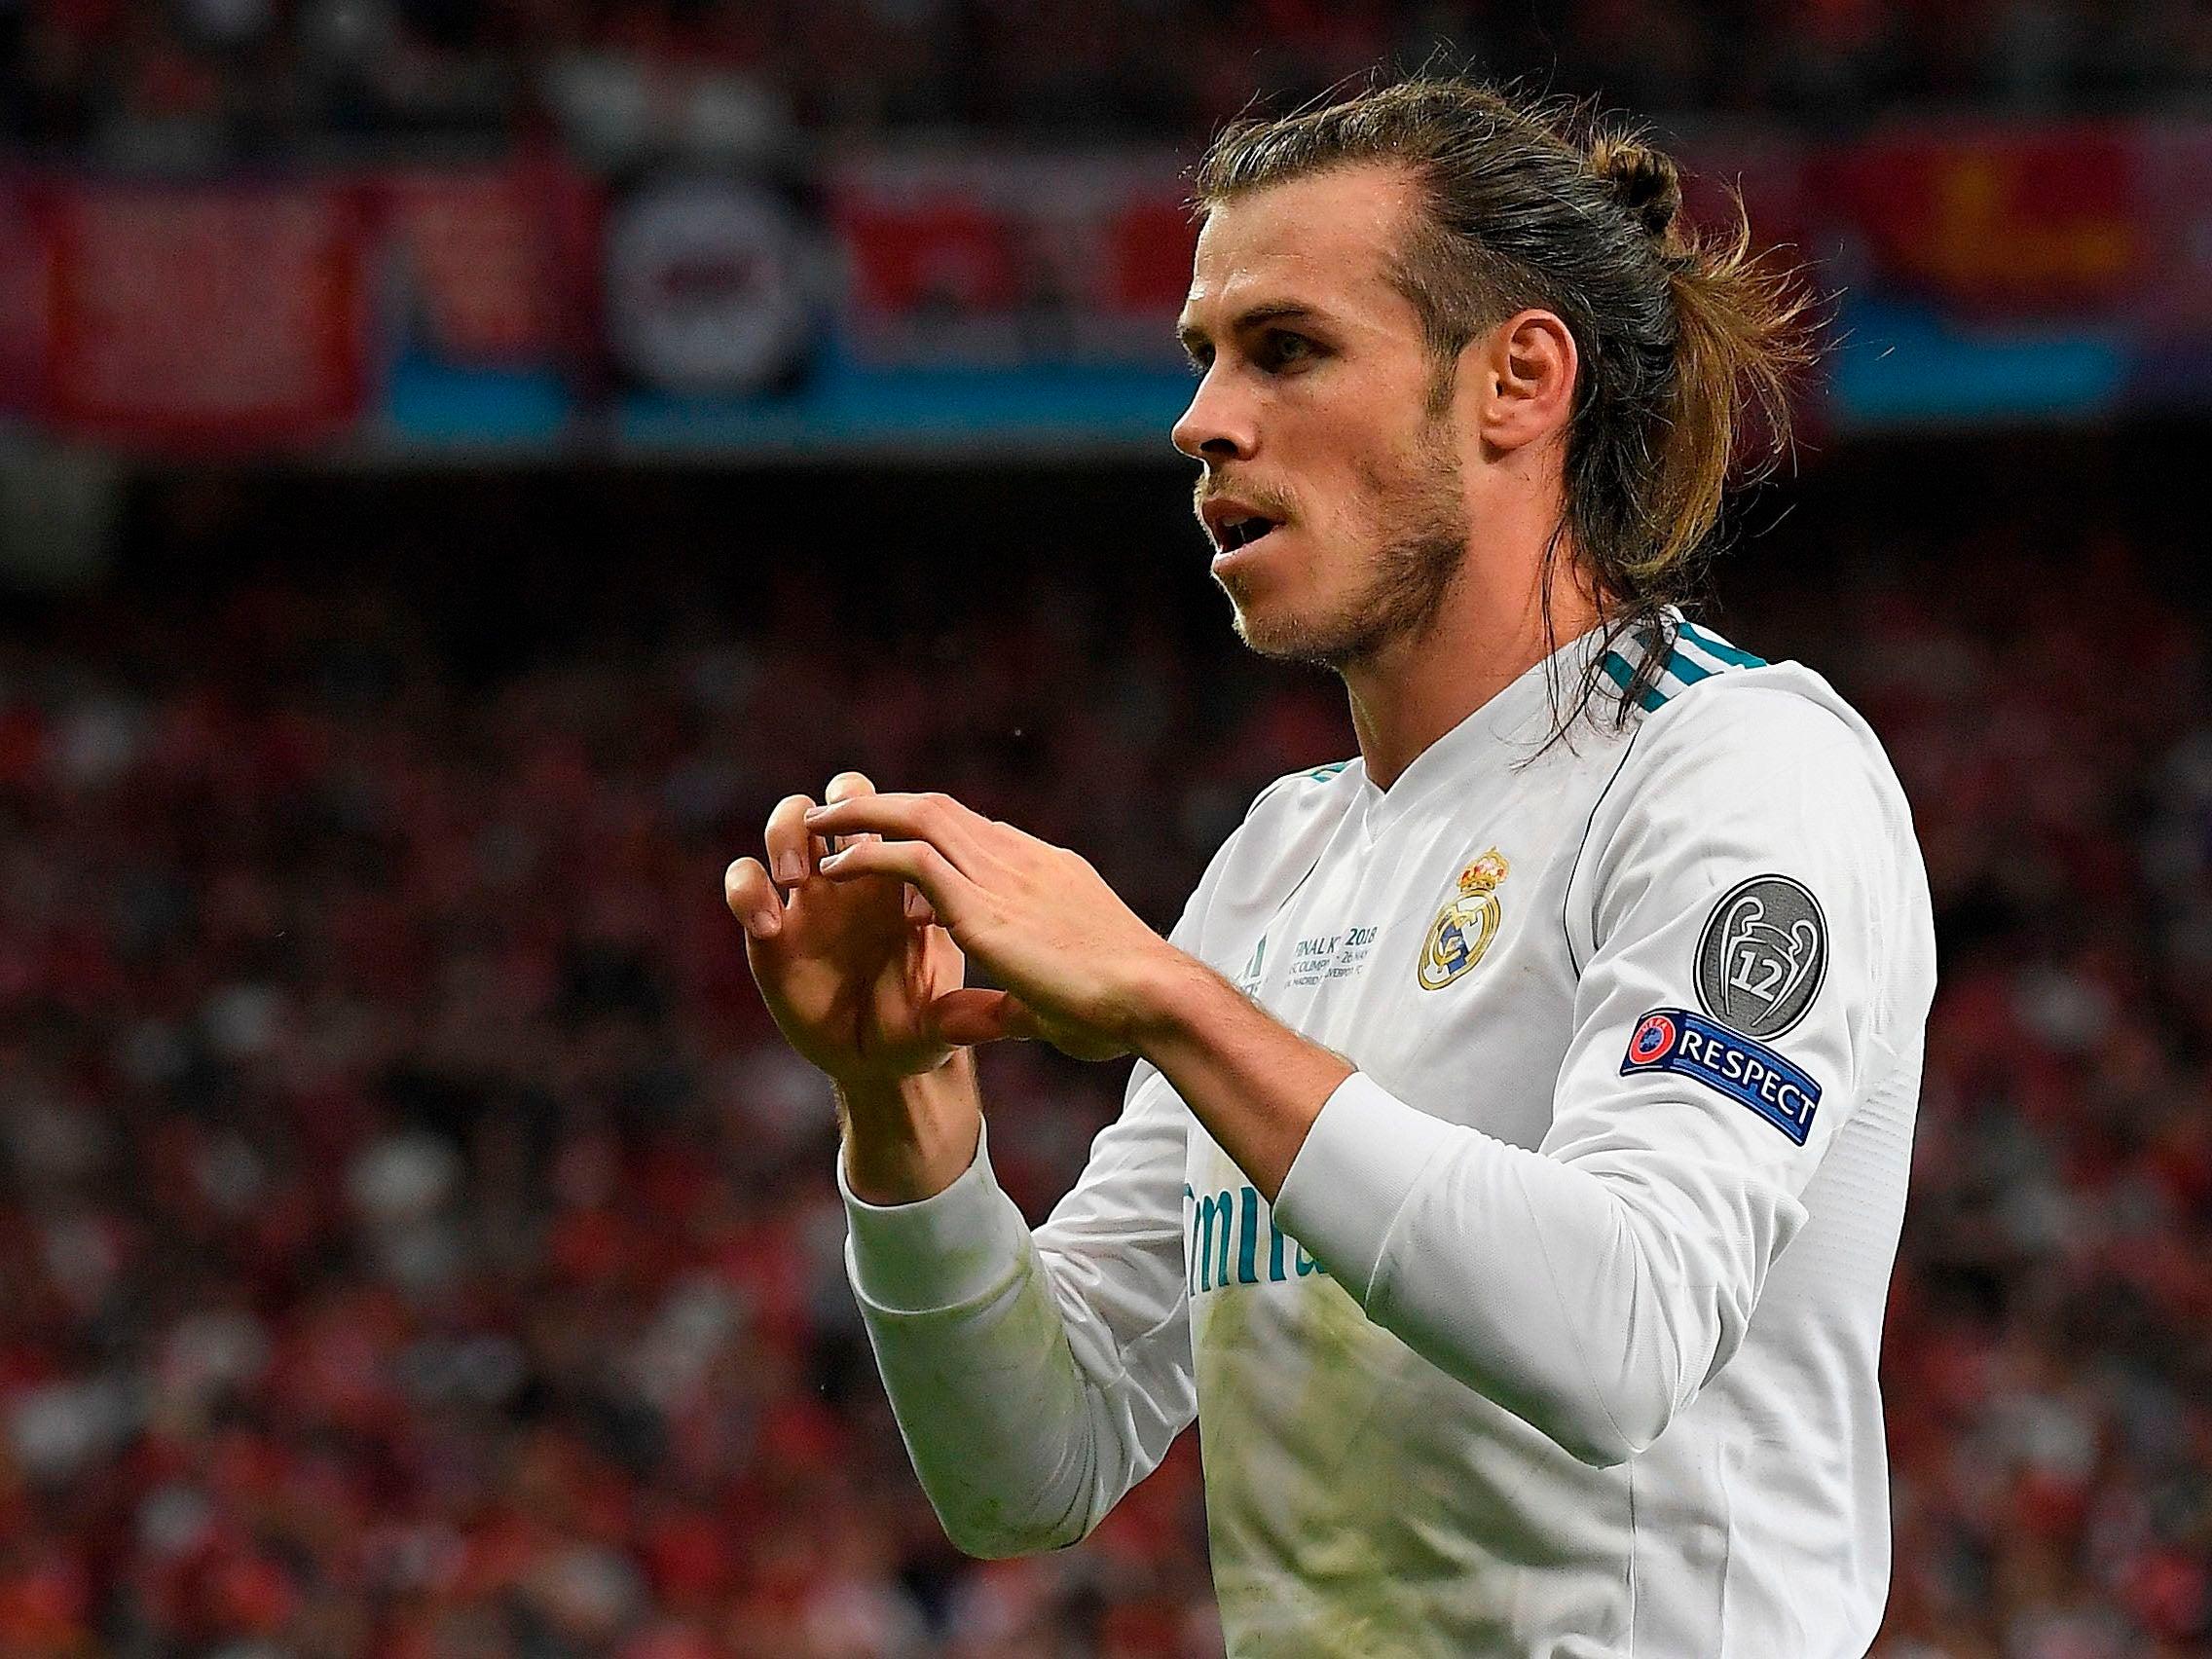 Gareth Bale reveals Real Madrid manager Zinedine Zidane didn't speak to him after match-winning display